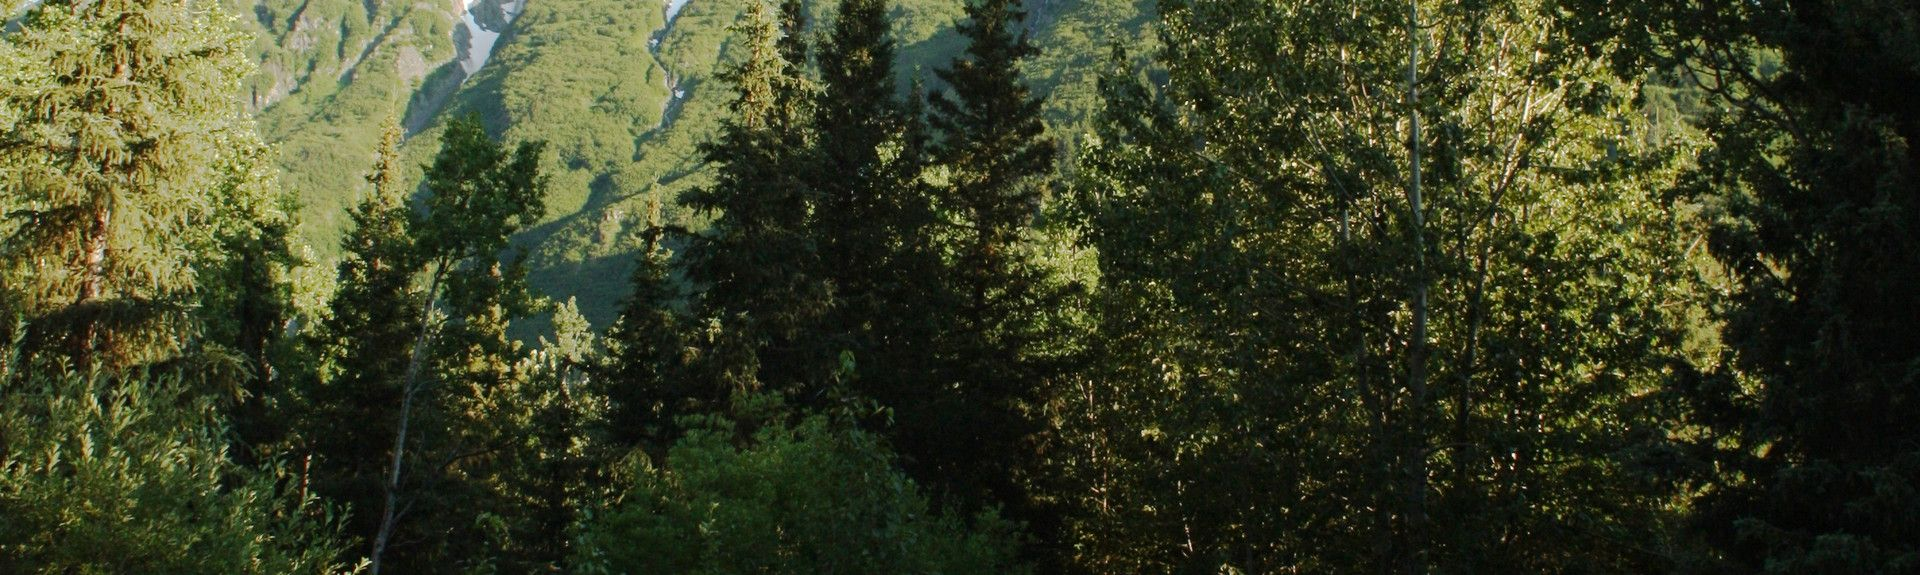 Moose Pass, AK, USA